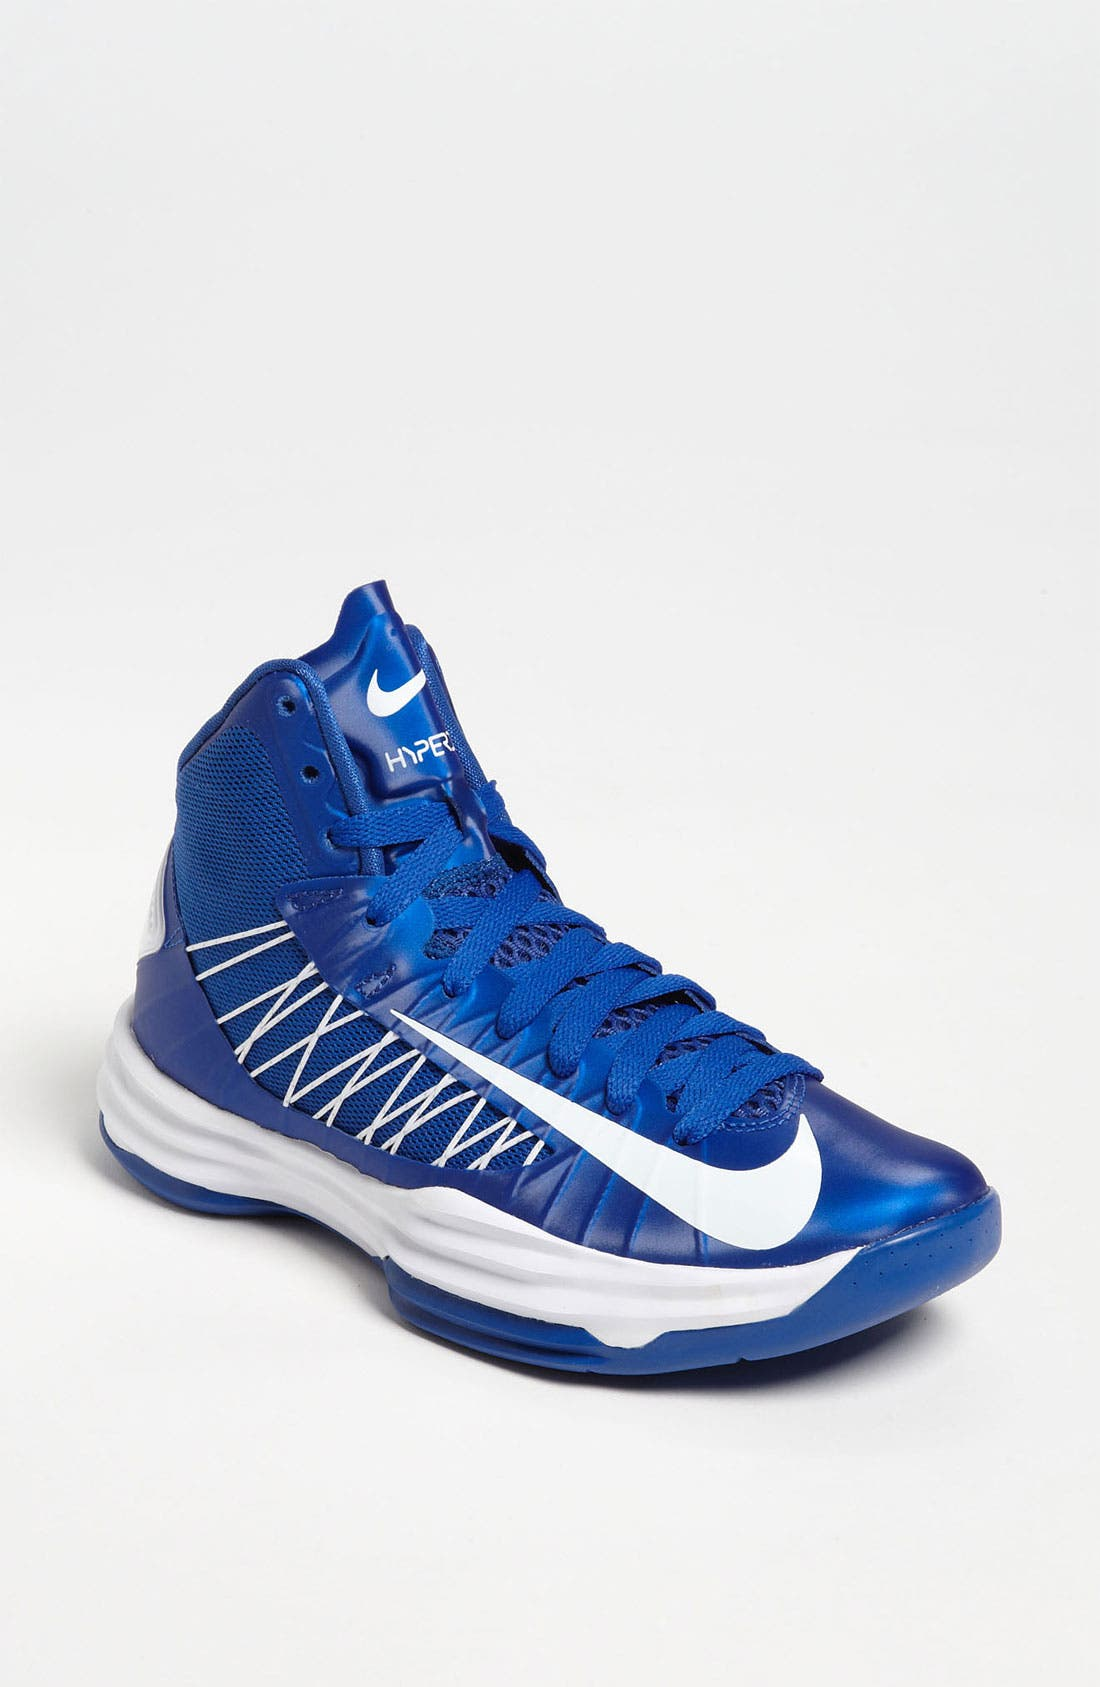 Alternate Image 1 Selected - Nike 'Lunar Hyperdunk' Basketball Shoe (Women)